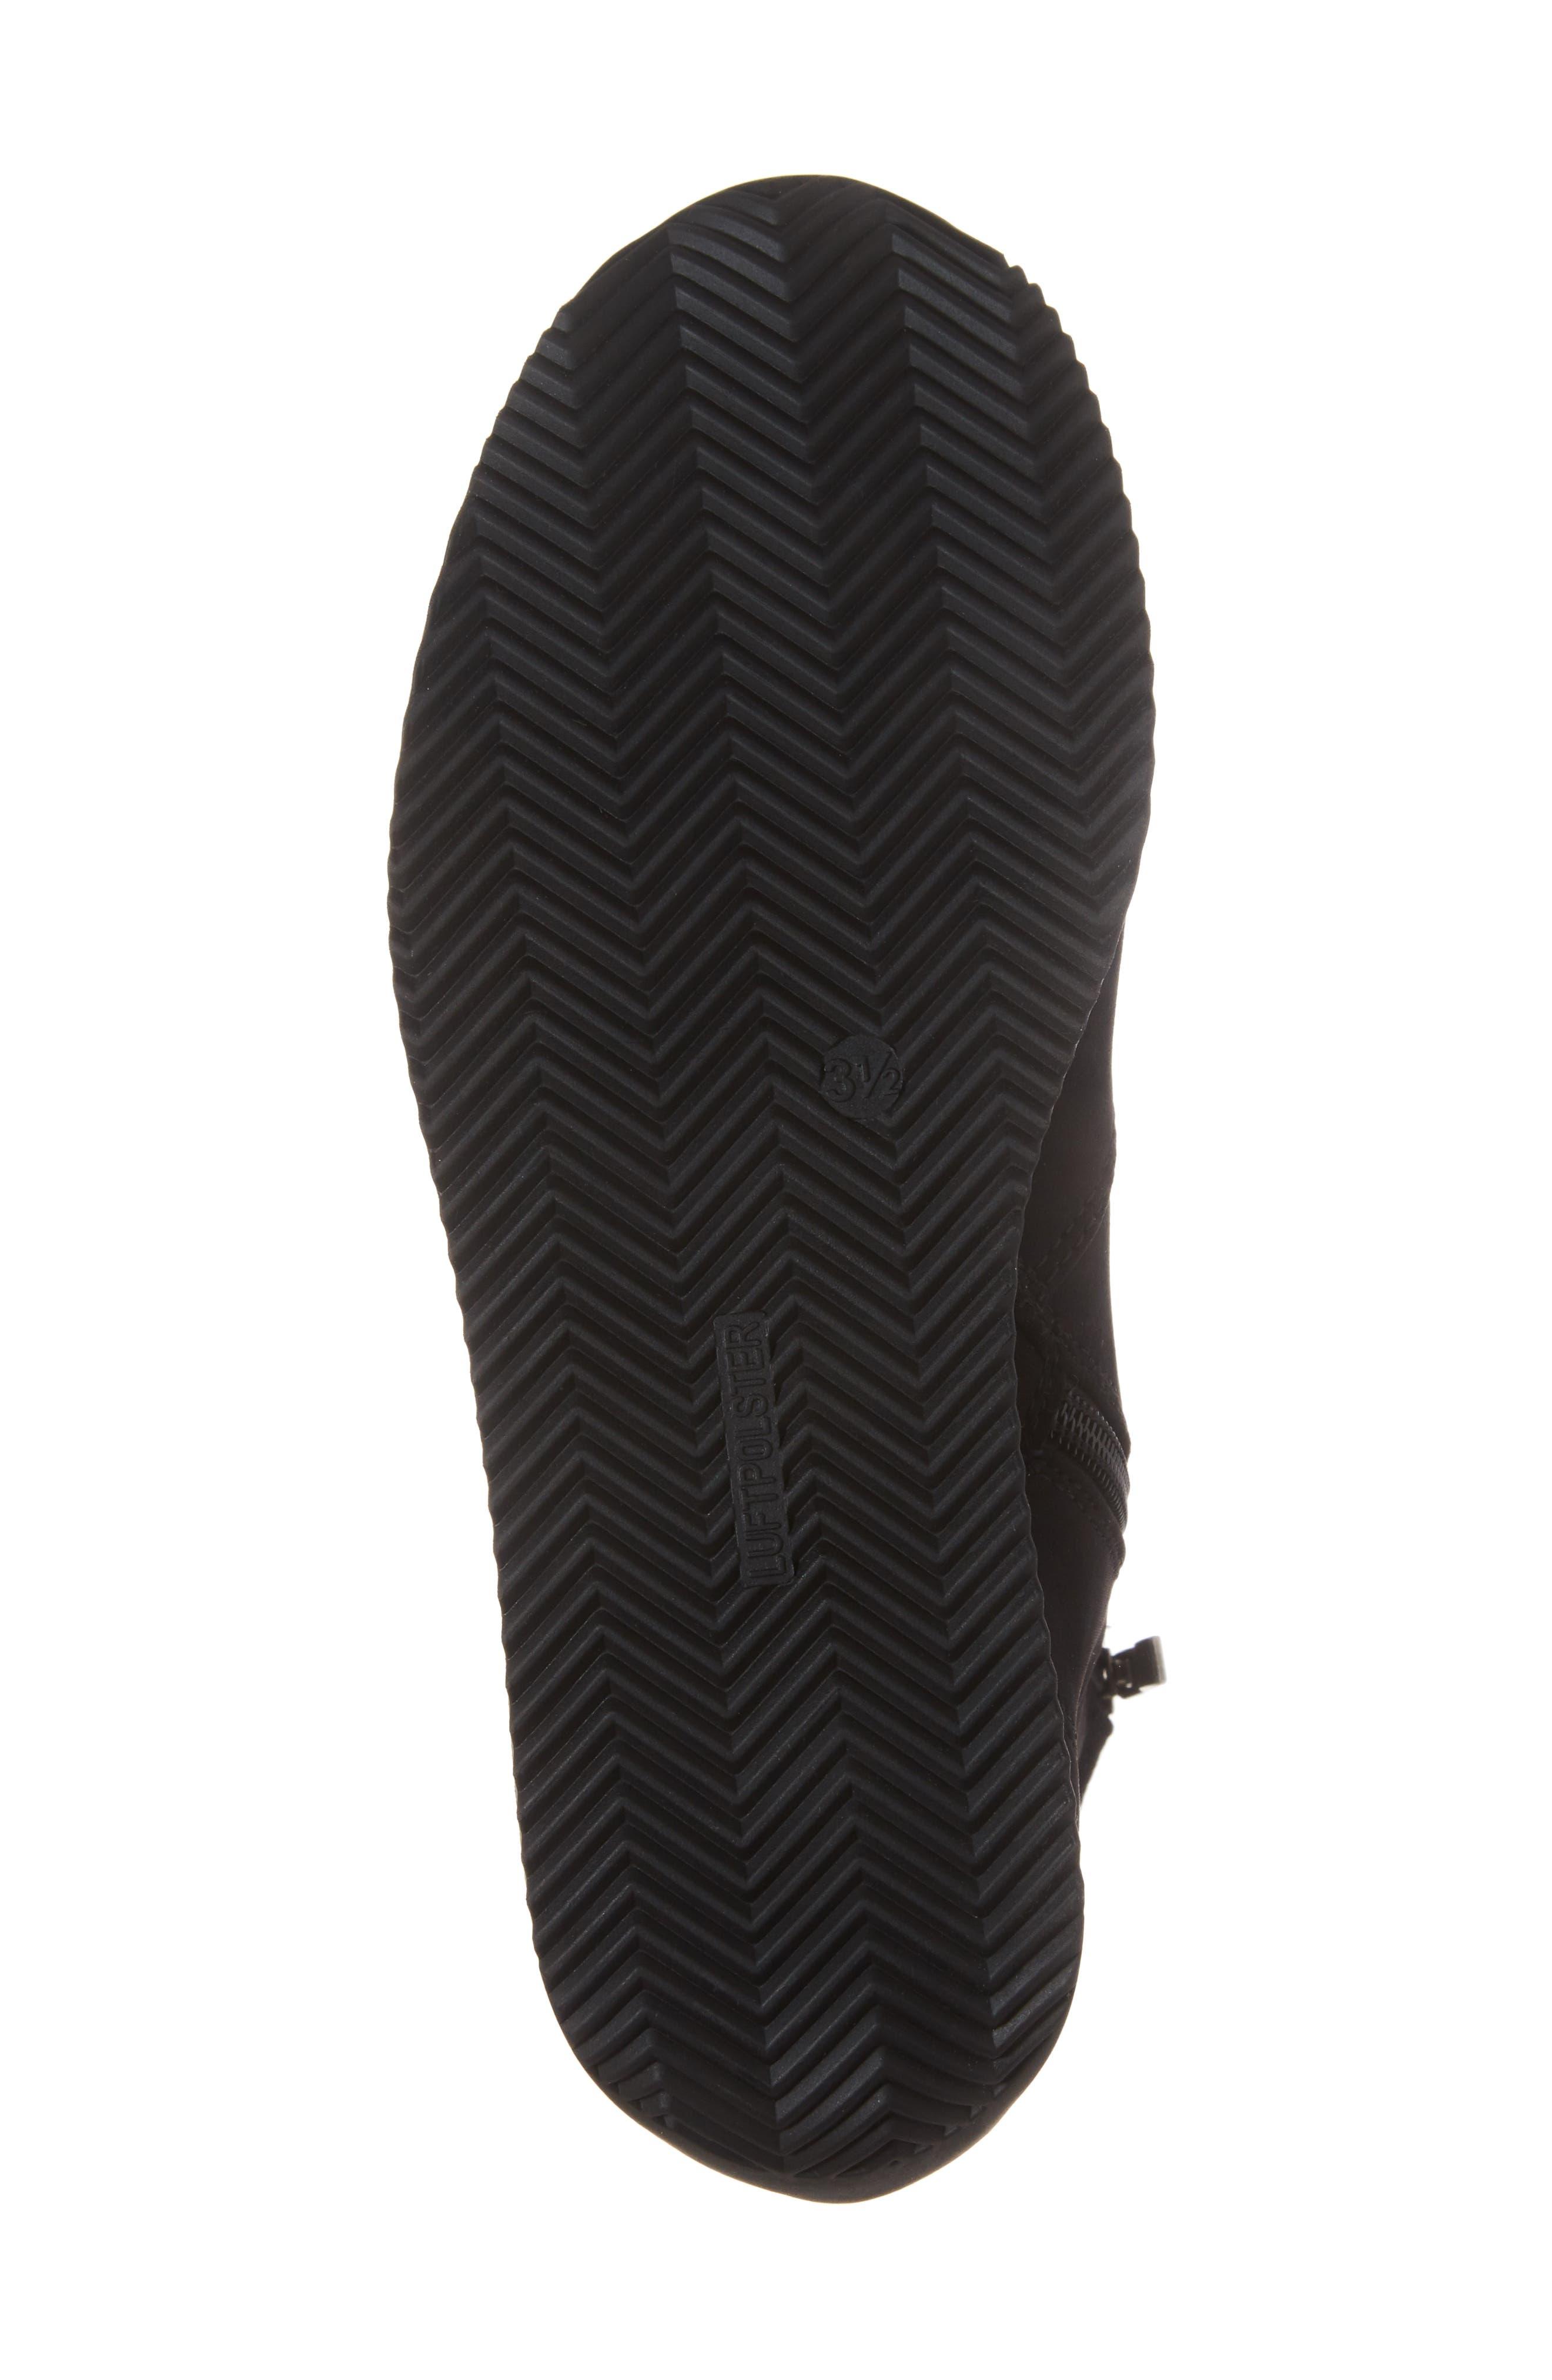 Luella Waterproof Gore-Tex<sup>®</sup> Boot,                             Alternate thumbnail 6, color,                             Black Textile